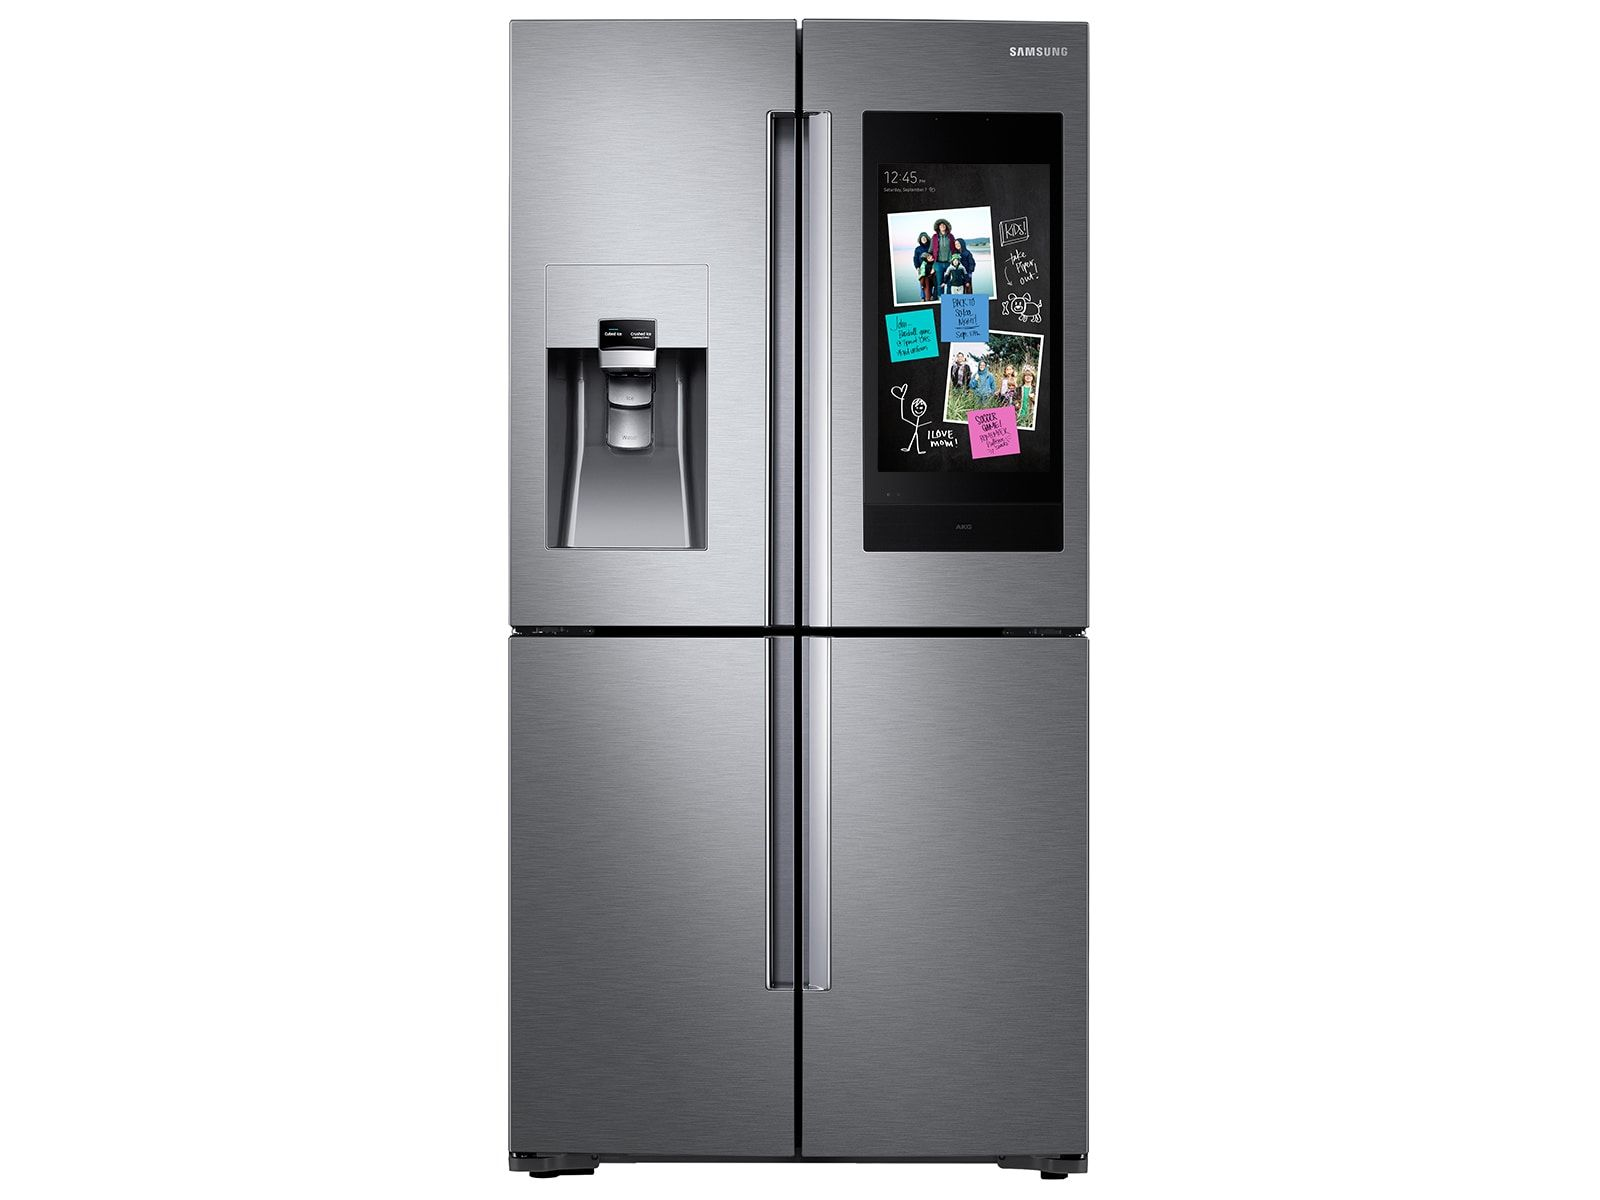 22 Cu Ft Family Hub Counter Depth 4 Door Flex Refrigerator In Stainless Steel In 2020 Refrigerator Counter Depth Stainless Steel Refrigerator